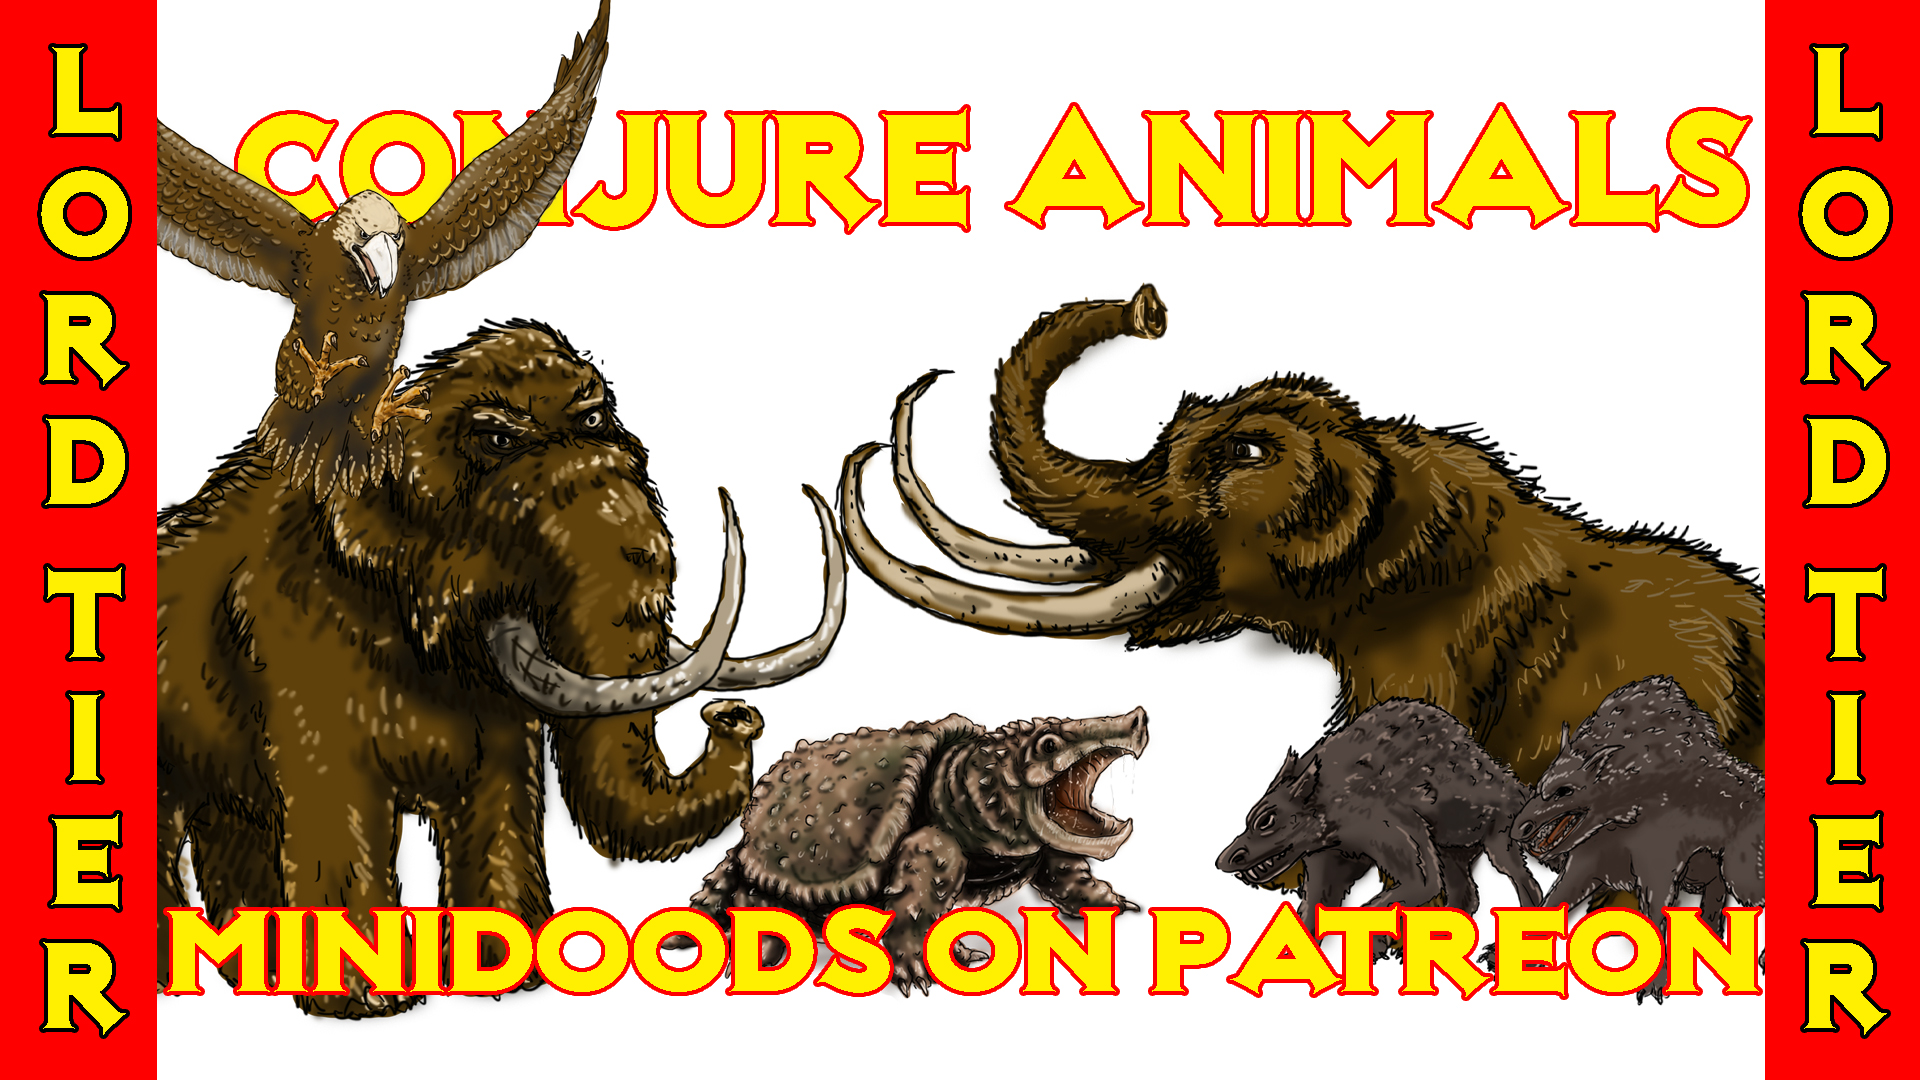 PROMO GROUP SHOT conjure animals part 2